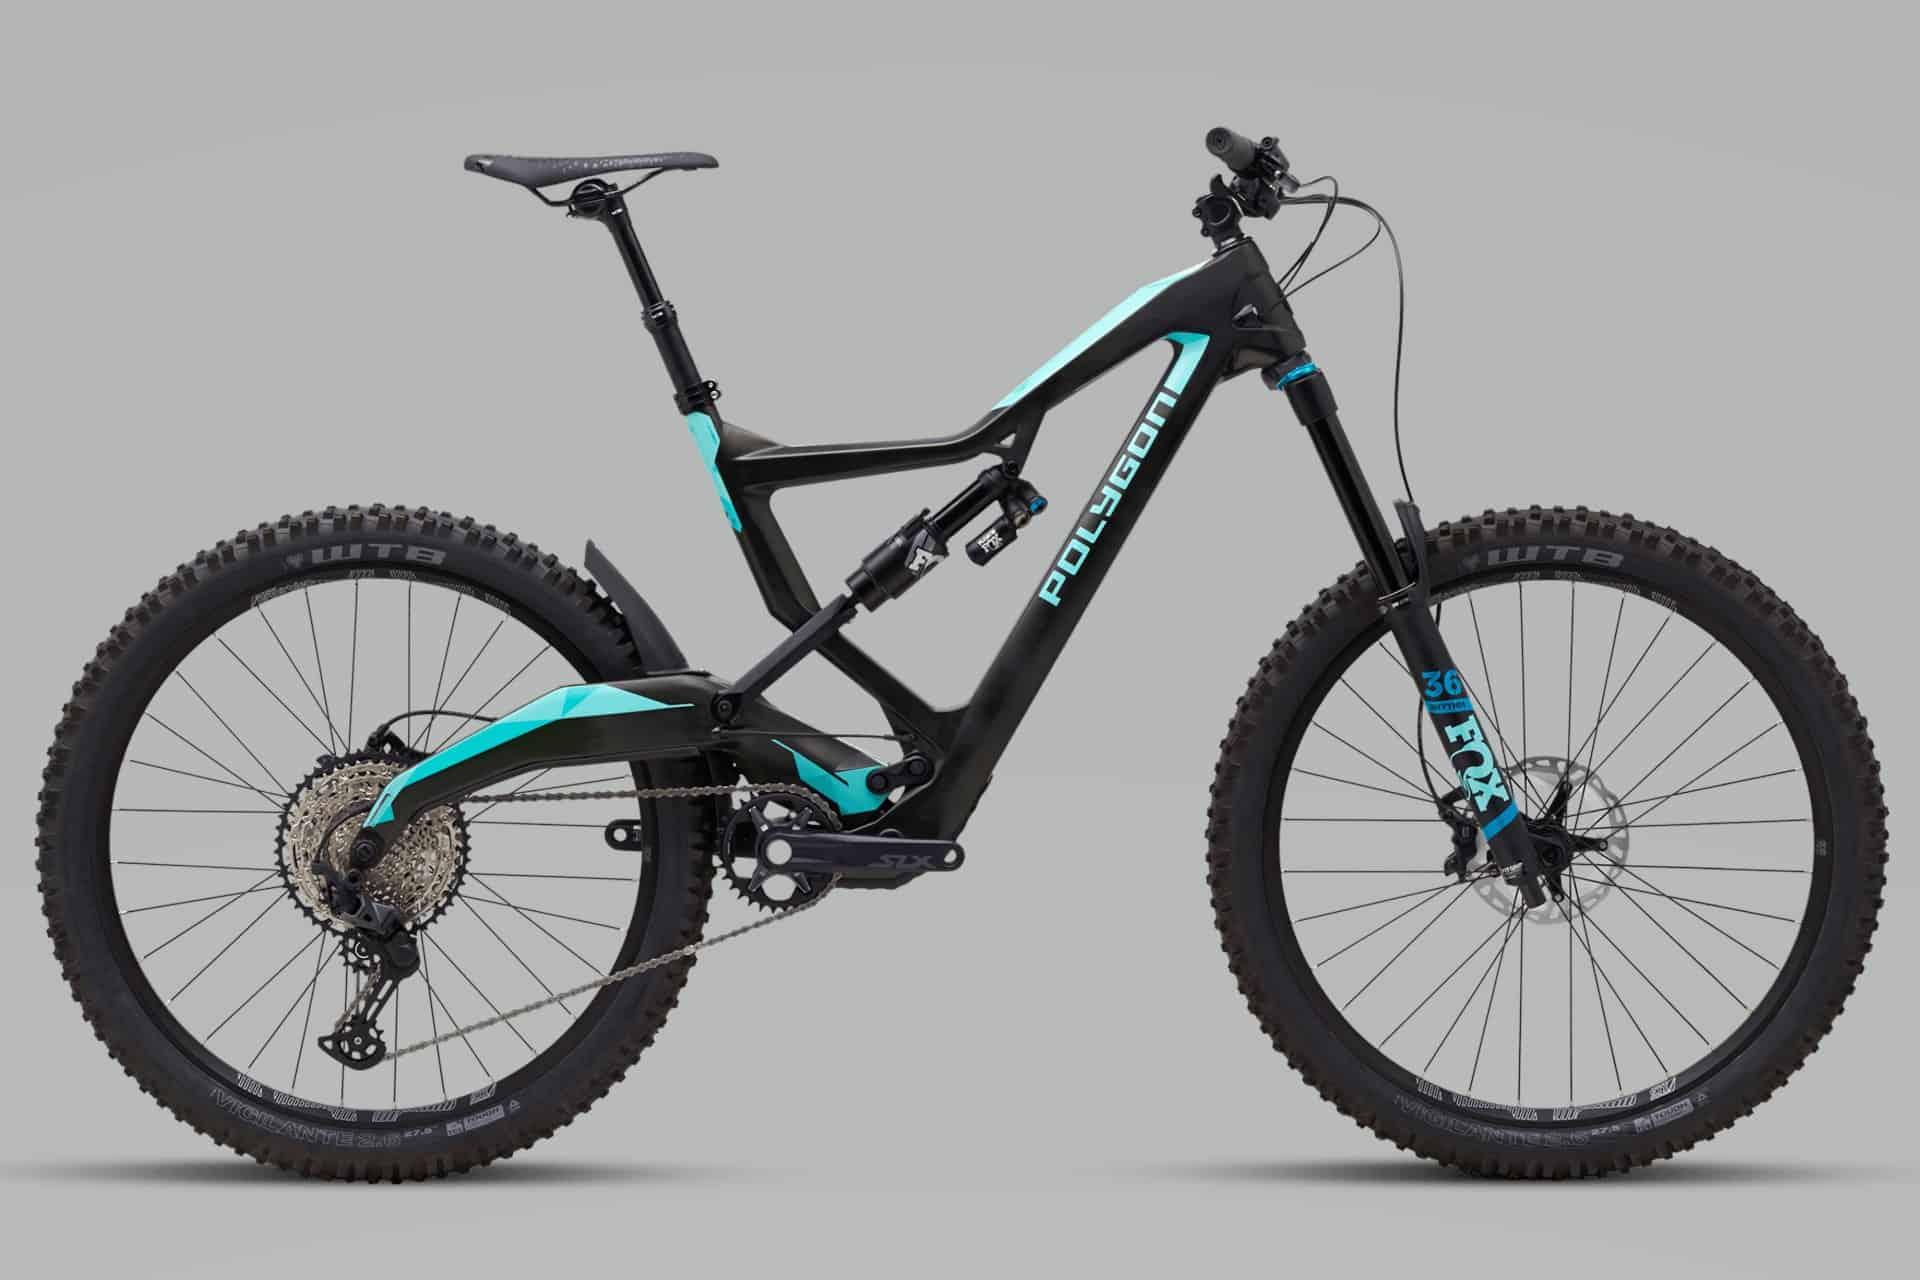 Spesifikasi dan Harga Polygon Xquarone Ex7 Sepeda.Me